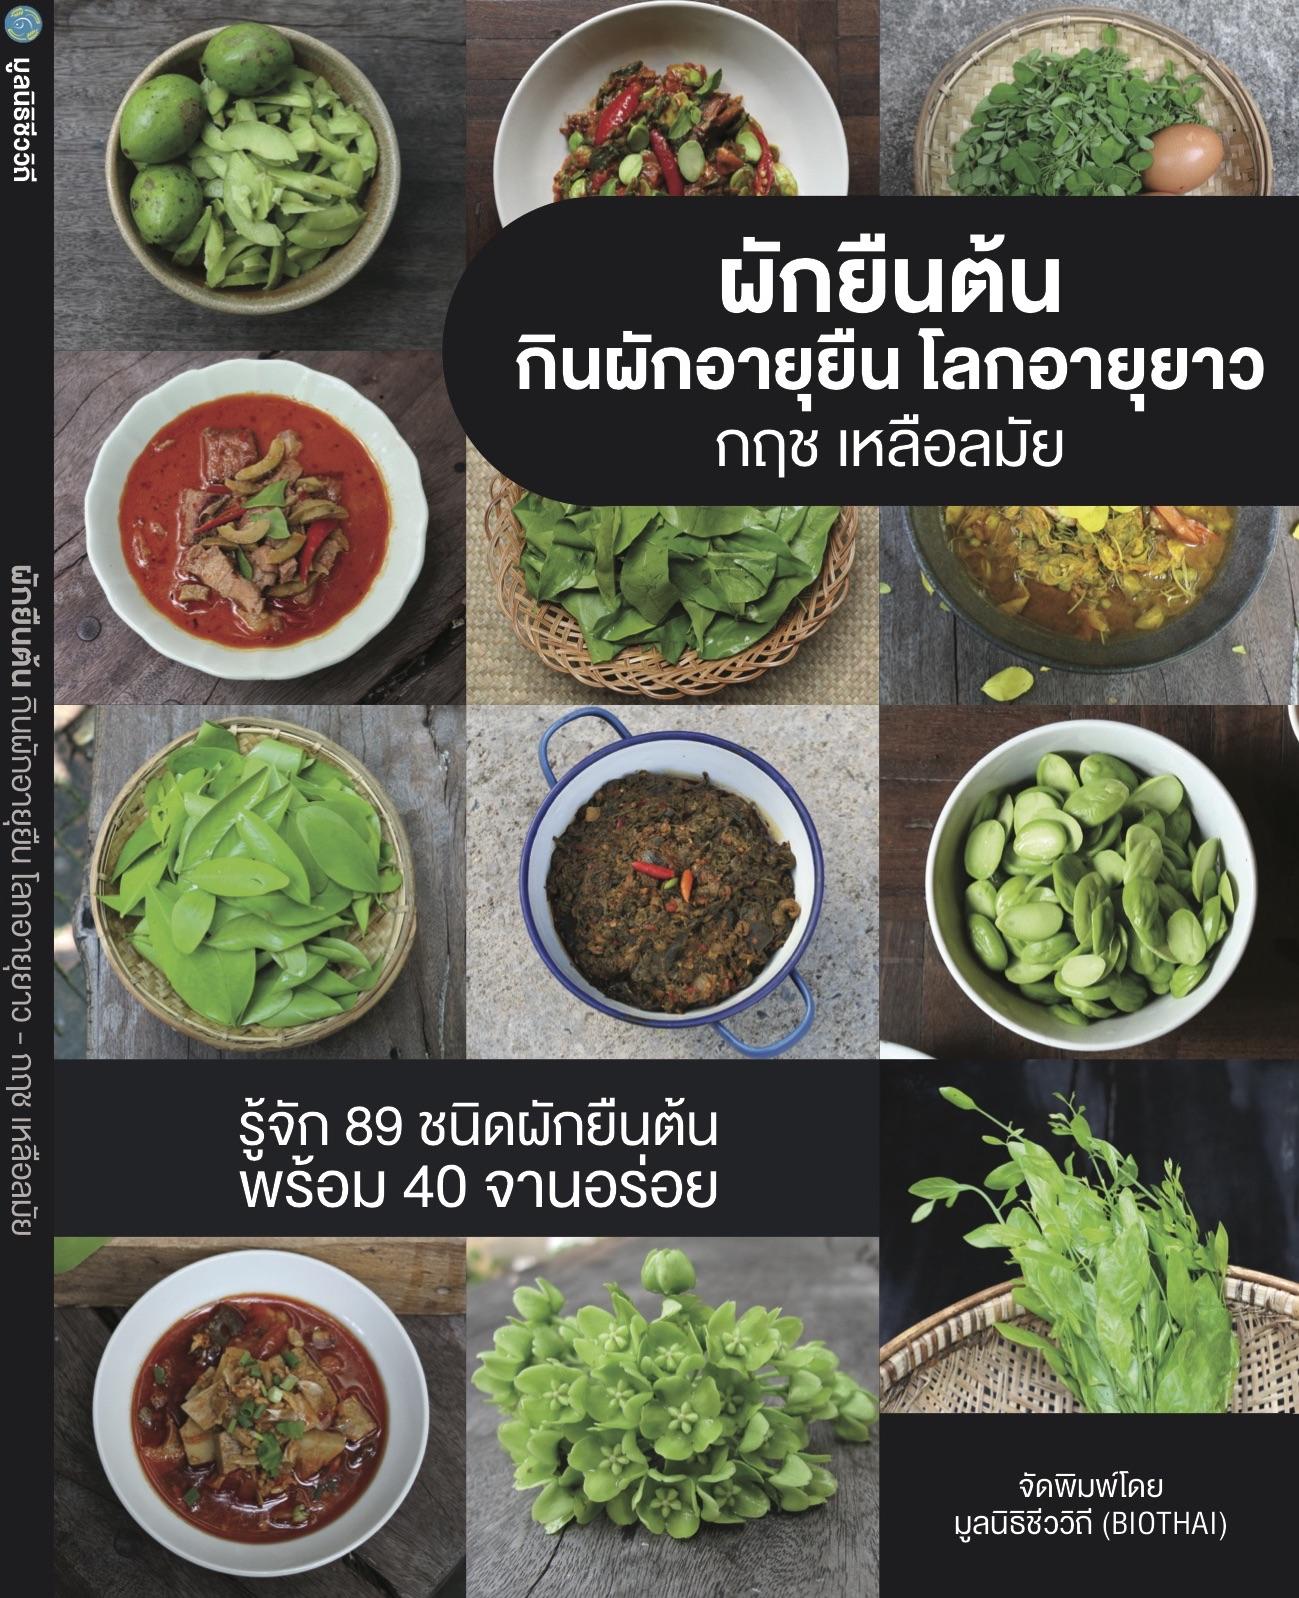 POK BOOK P.KRIT final